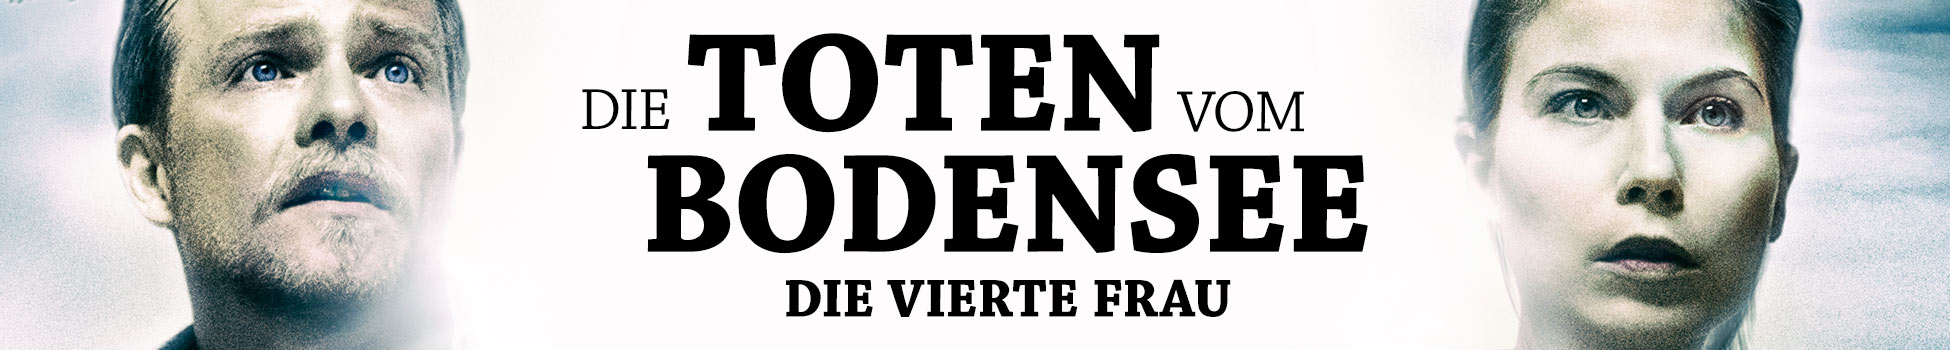 Die Toten vom Bodensee: Die vierte Frau - Artwork - Key Visual - Header